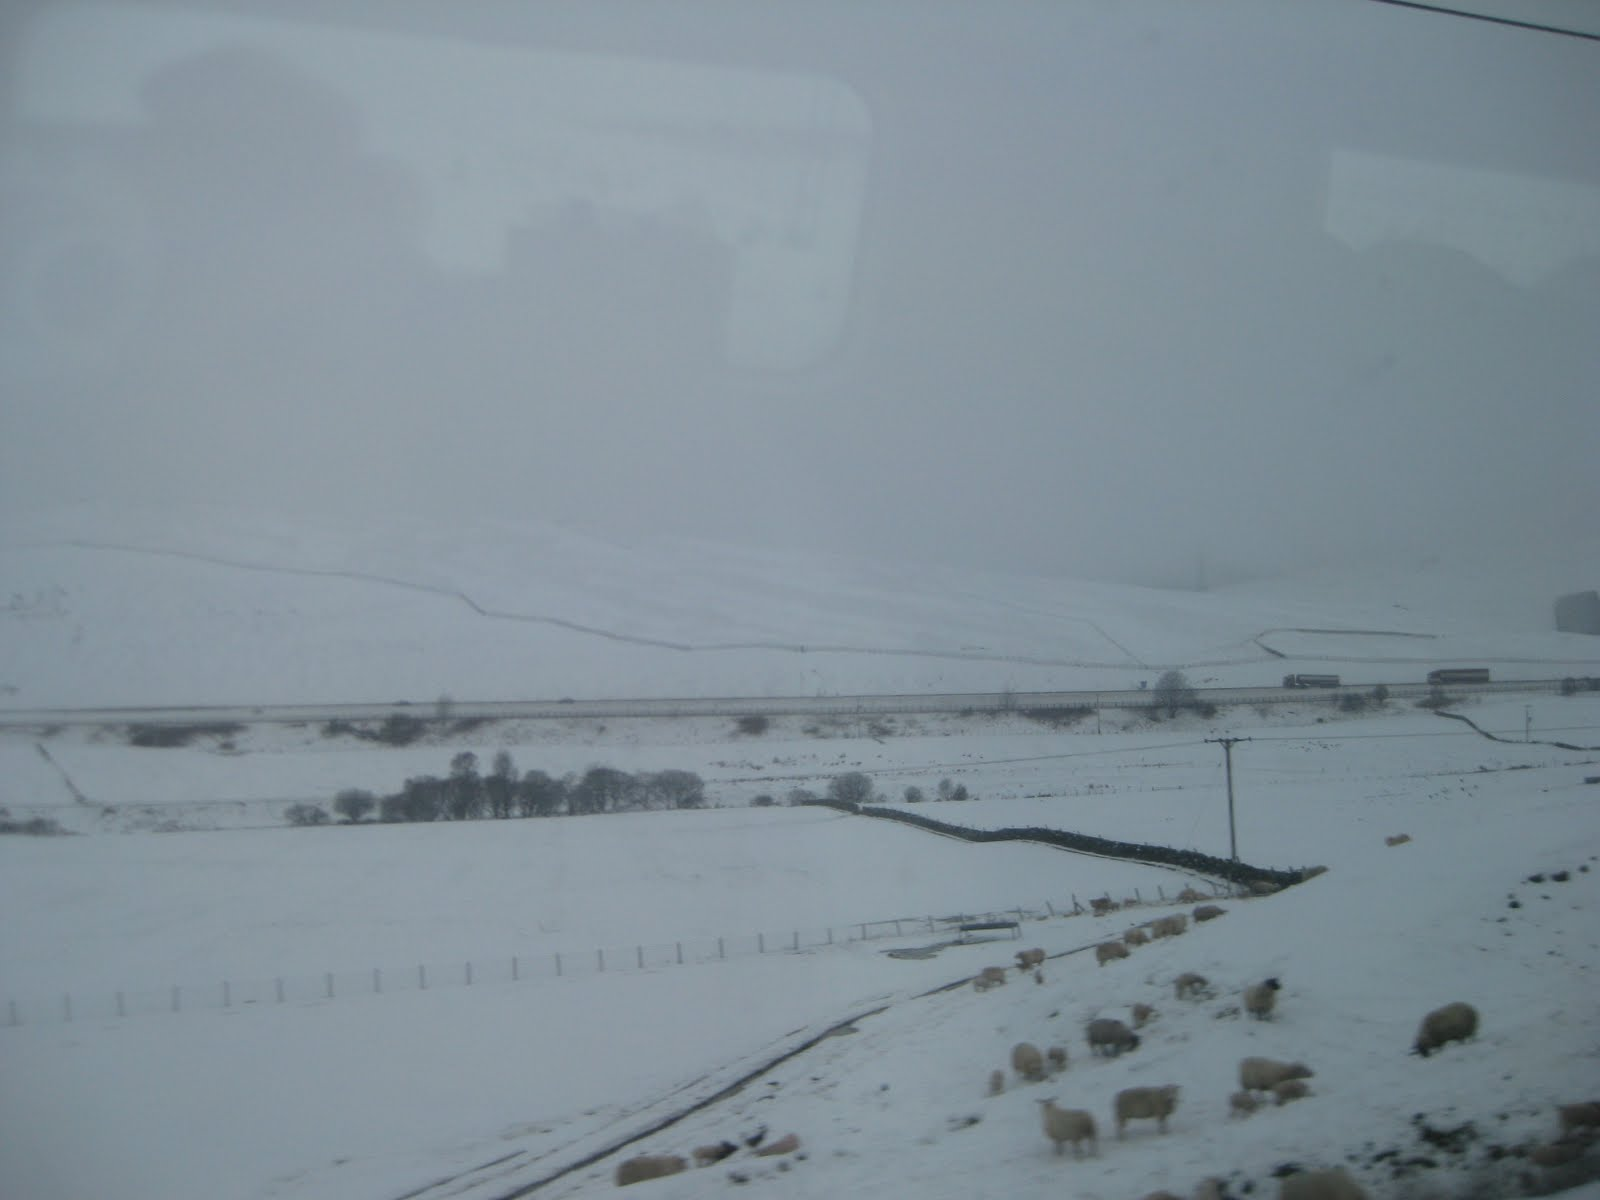 Borders region, viewed from a warm train